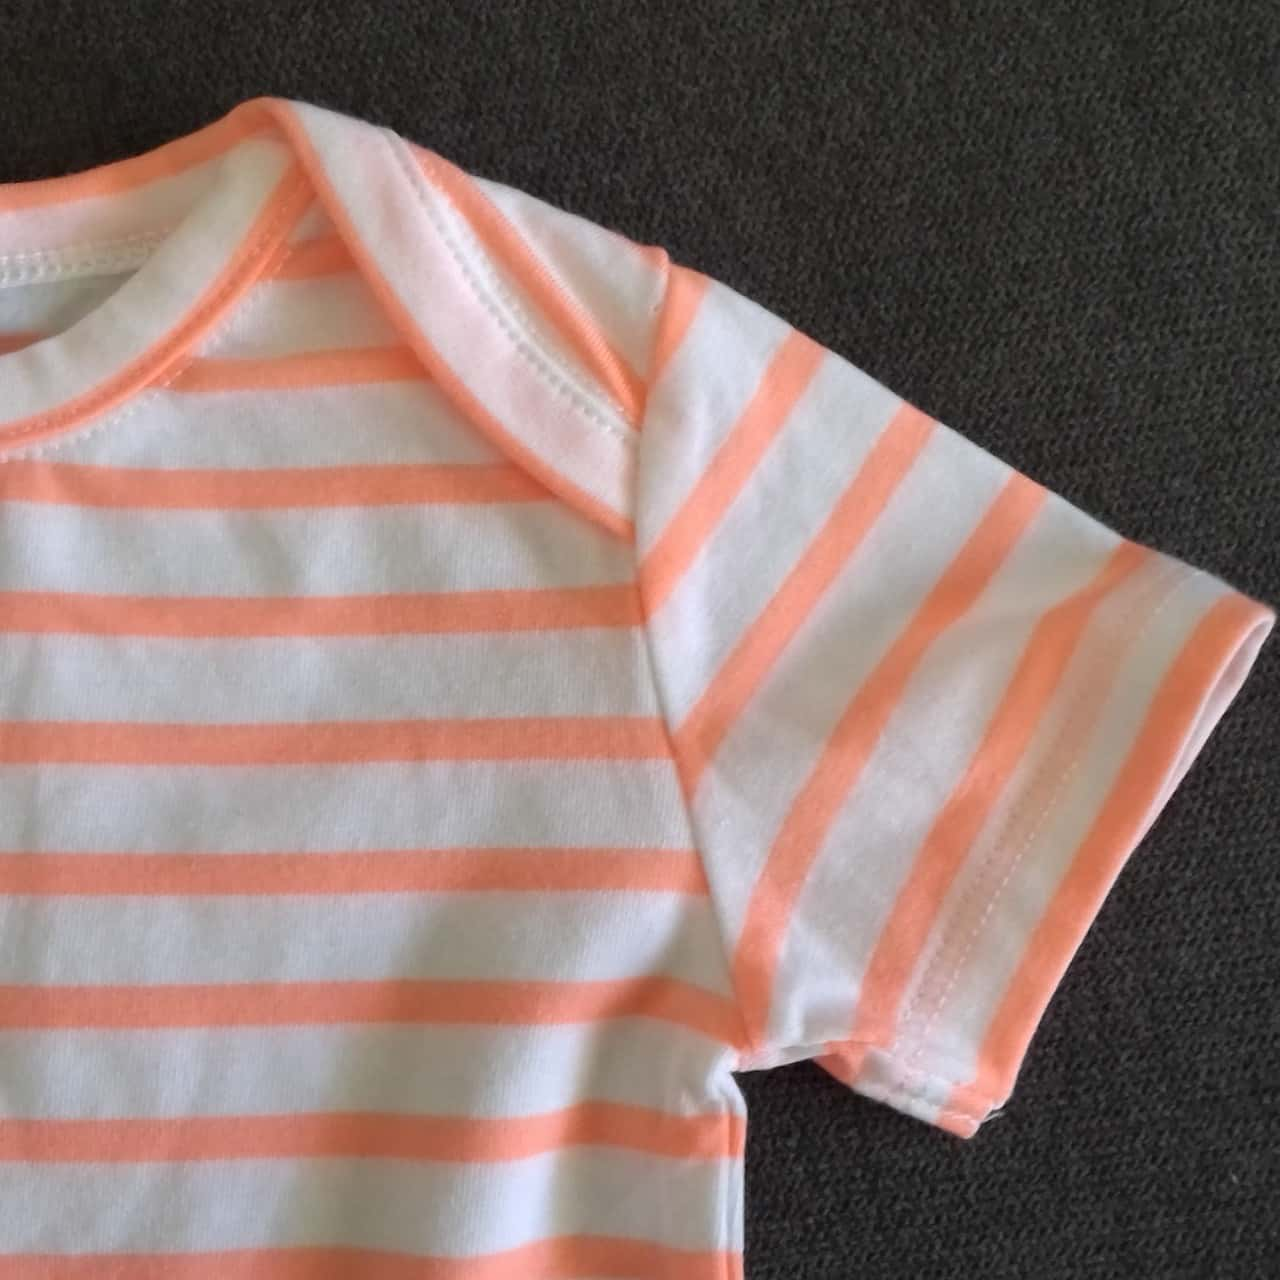 BNWT Baby BONDS T SHIRT Size 00  Orange/White